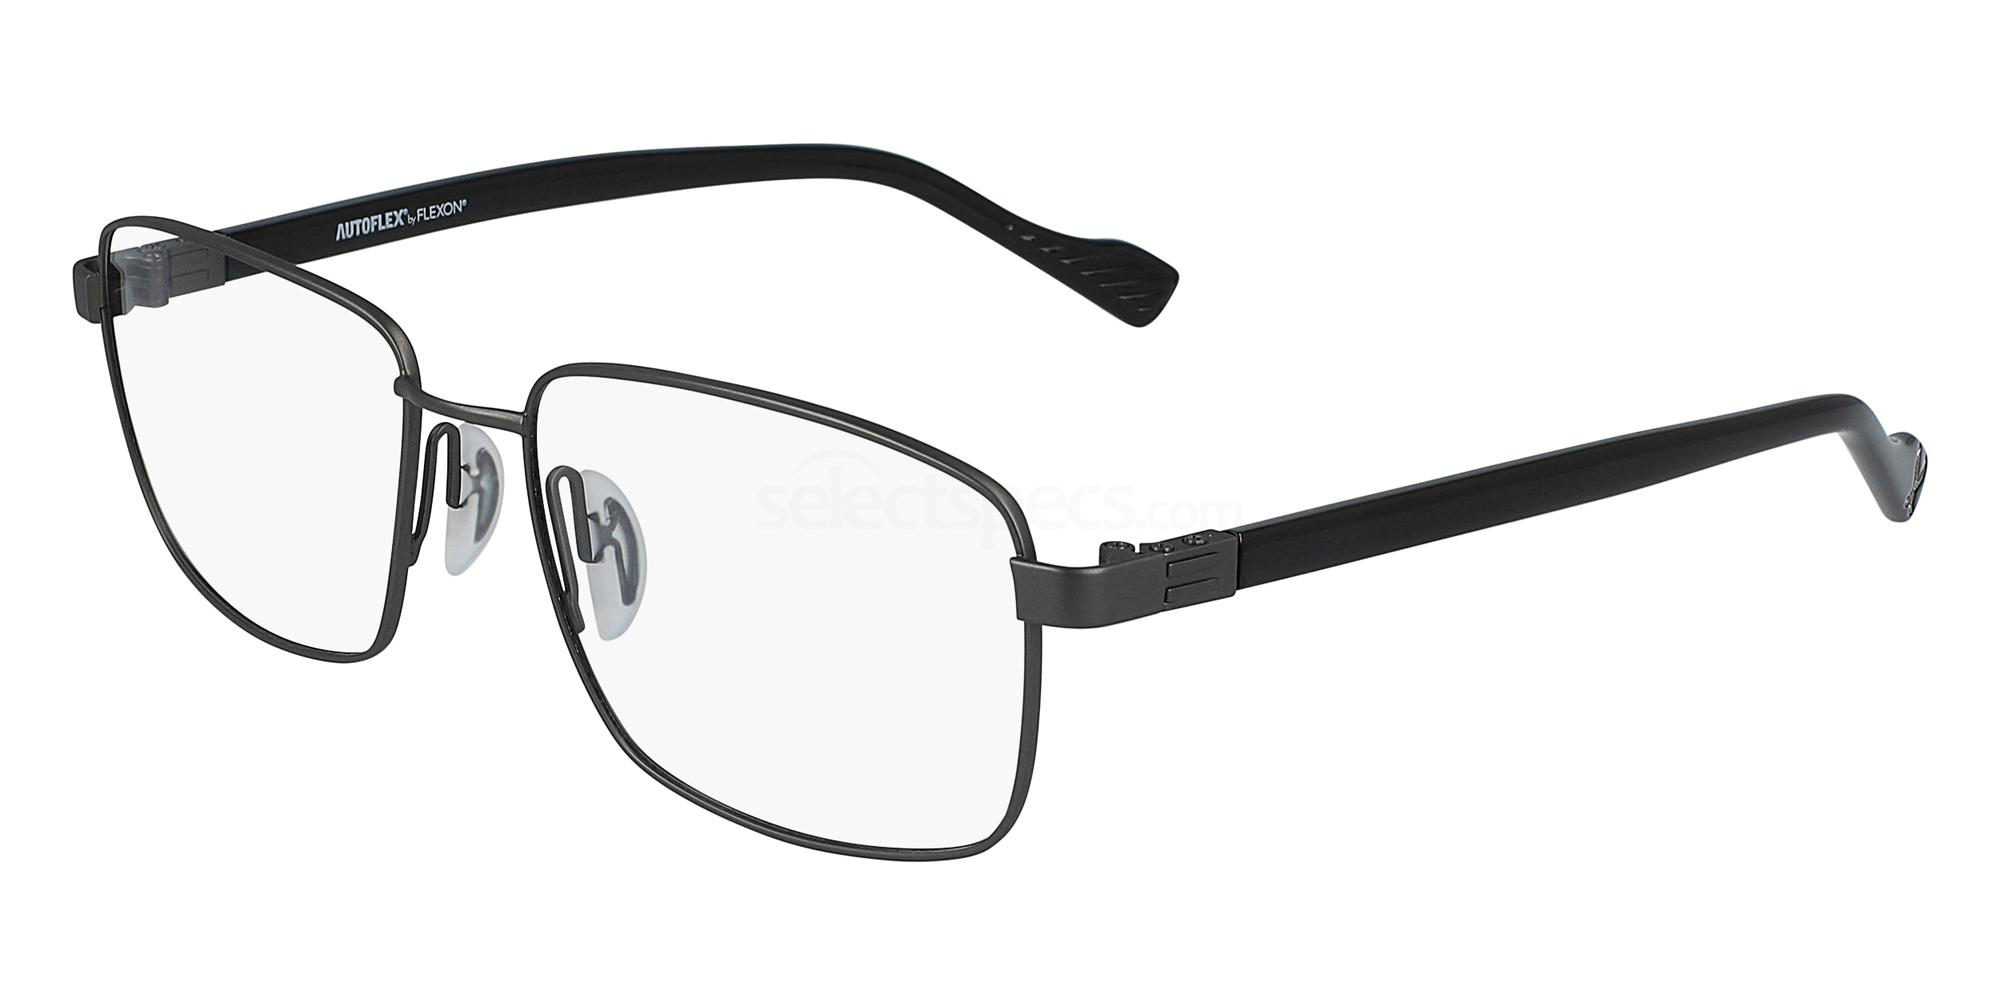 033 AUTOFLEX 114 Glasses, Flexon